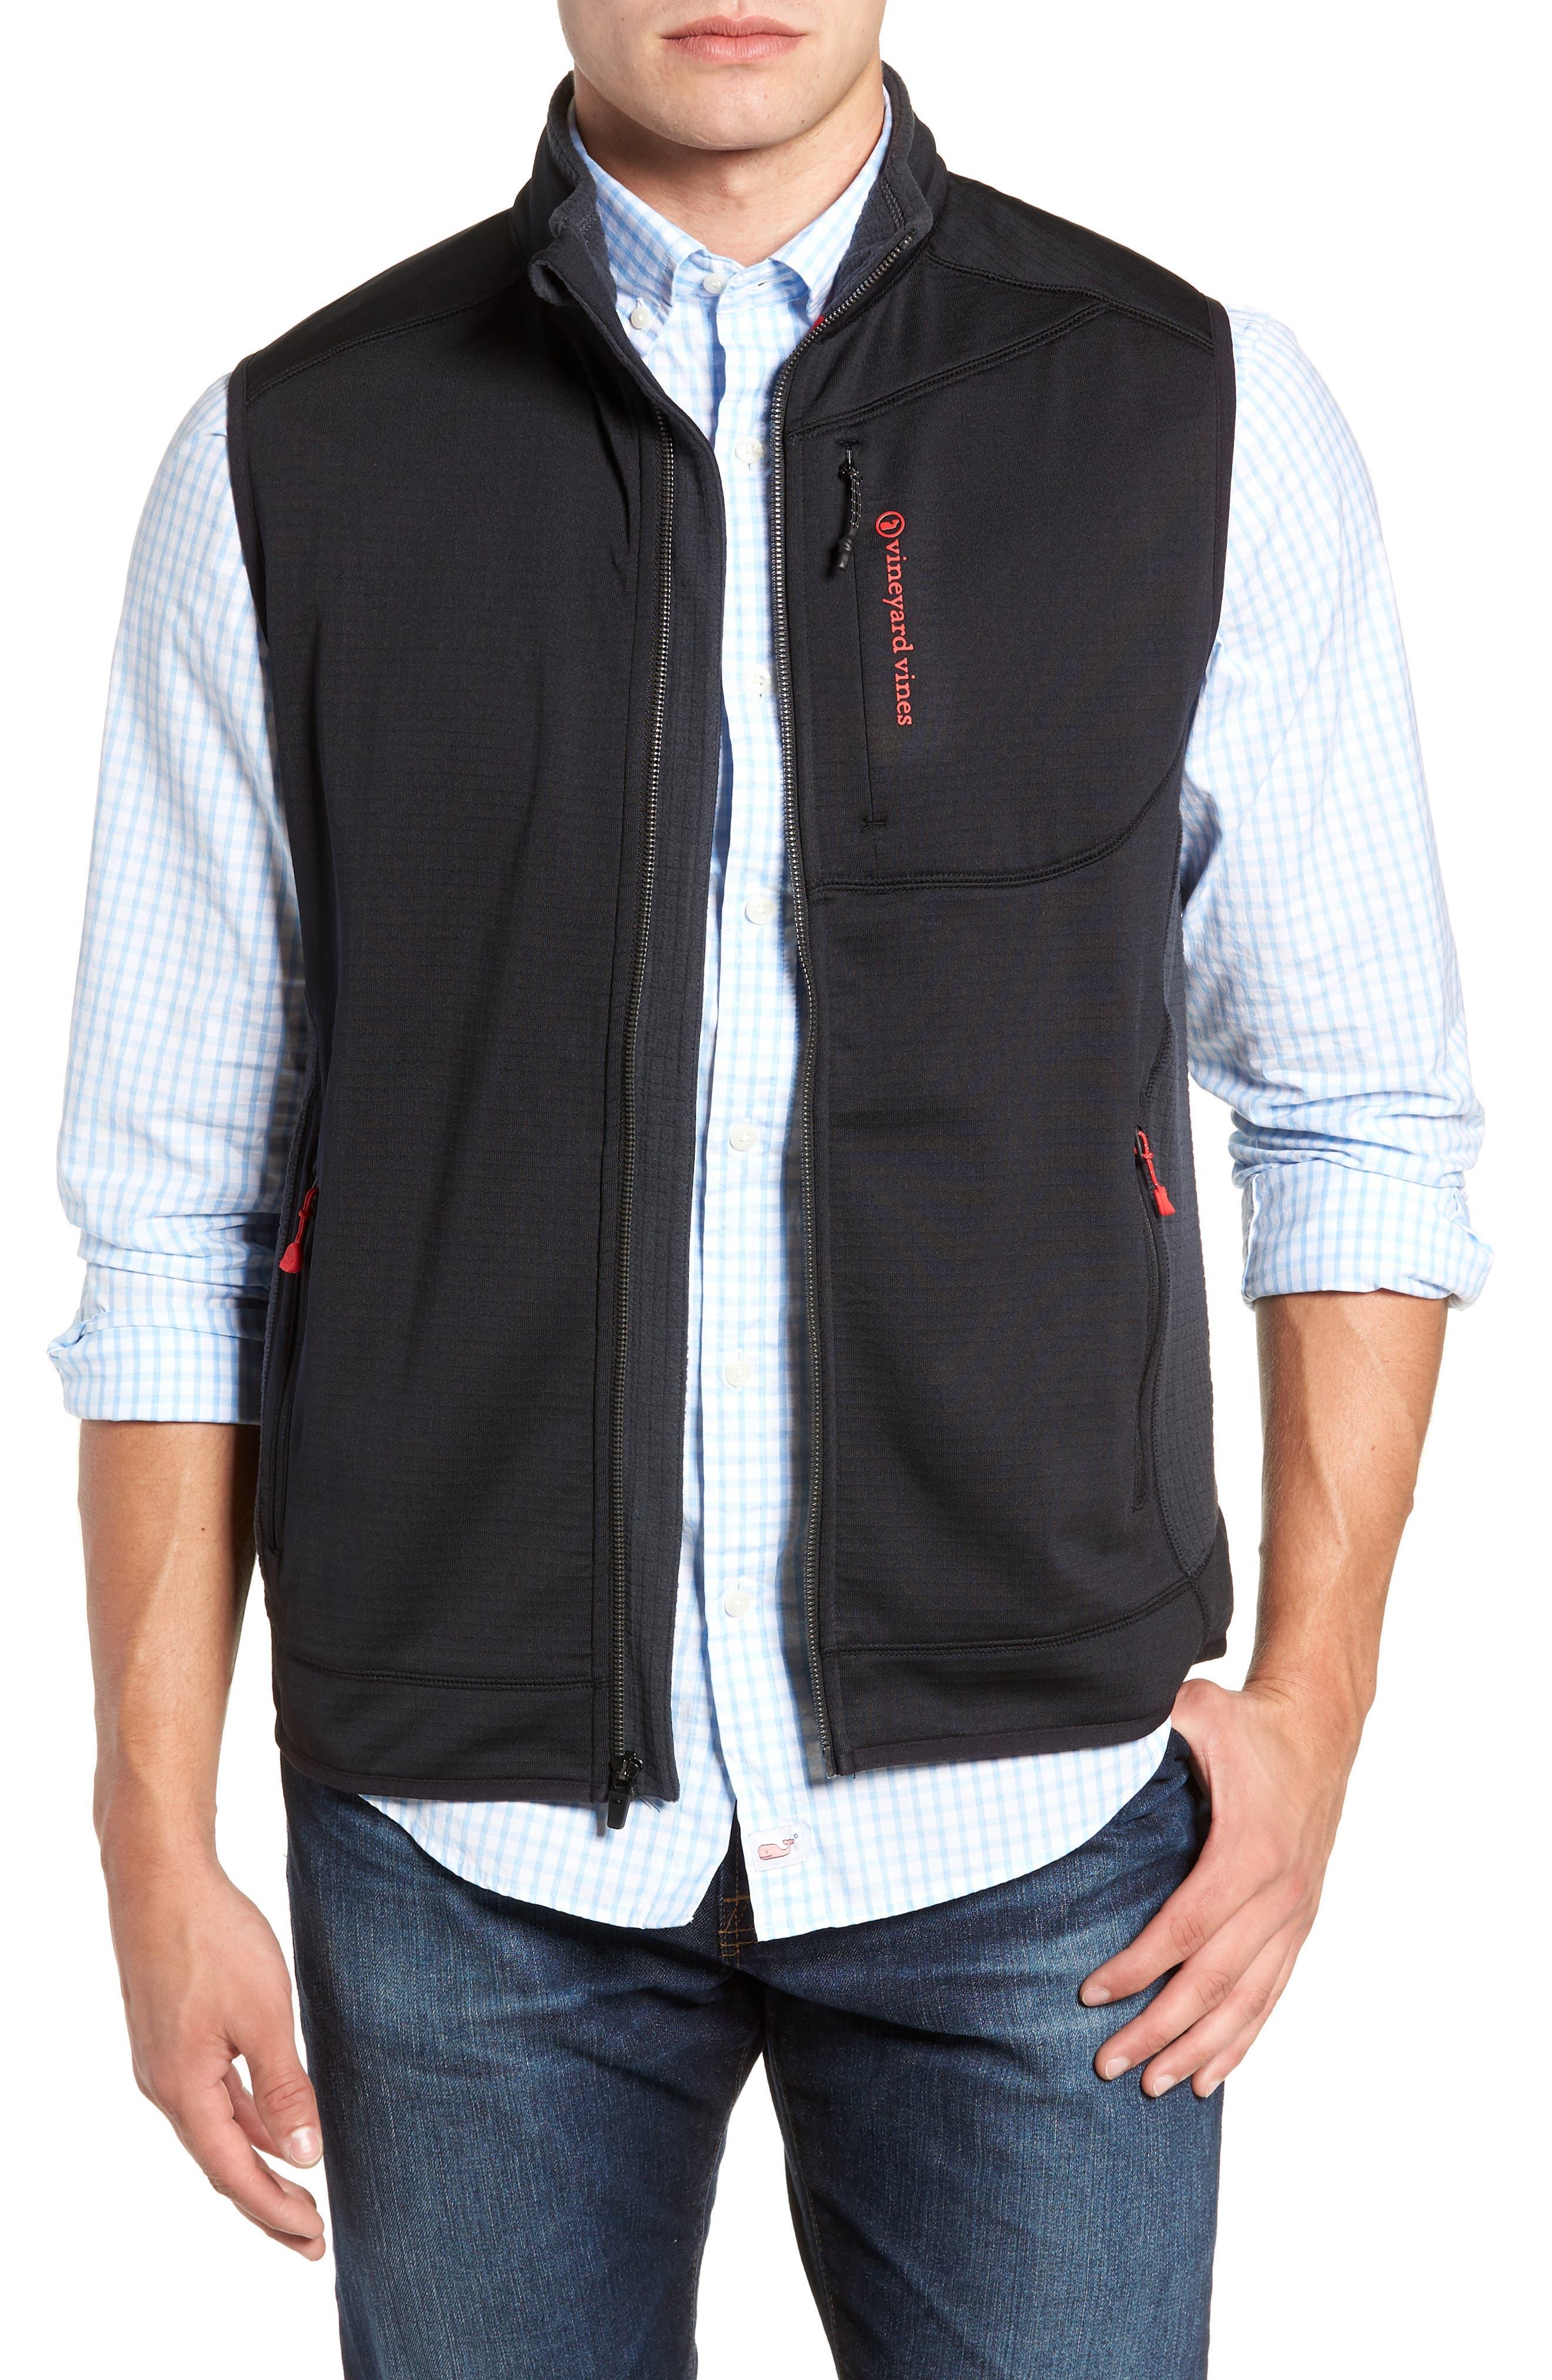 Grid Ripstop Fleece Vest,                         Main,                         color, 002